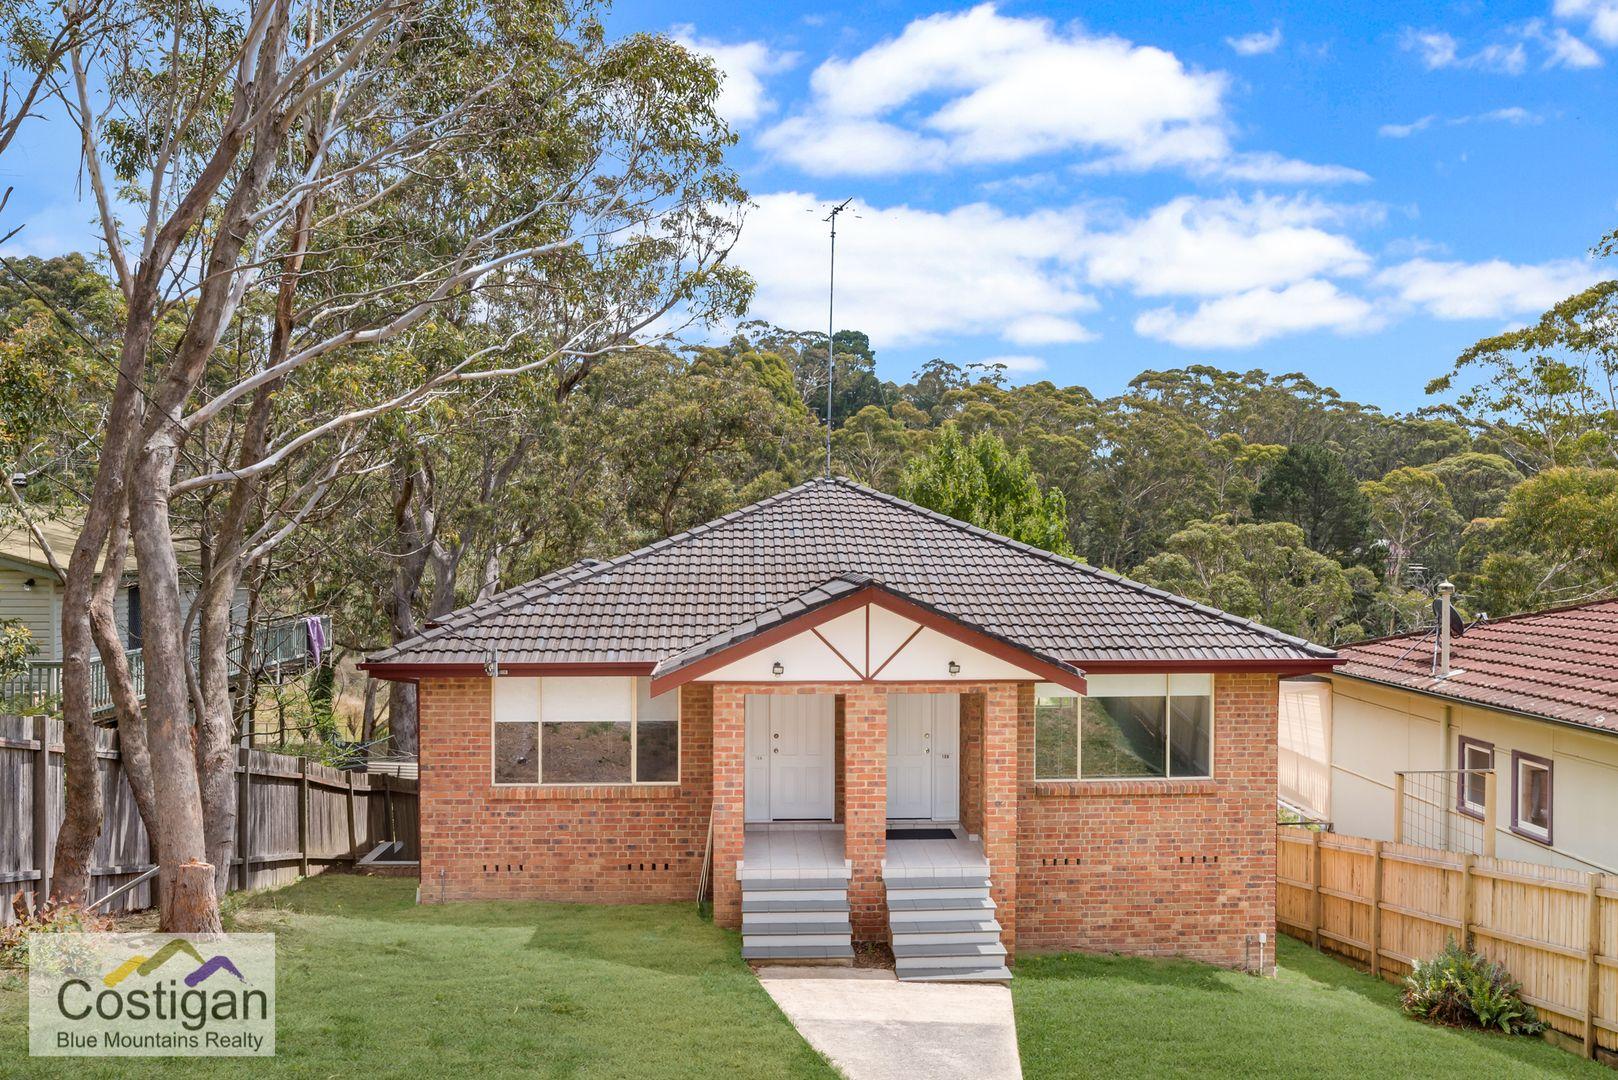 A/10 Eunoe St, Katoomba NSW 2780, Image 0